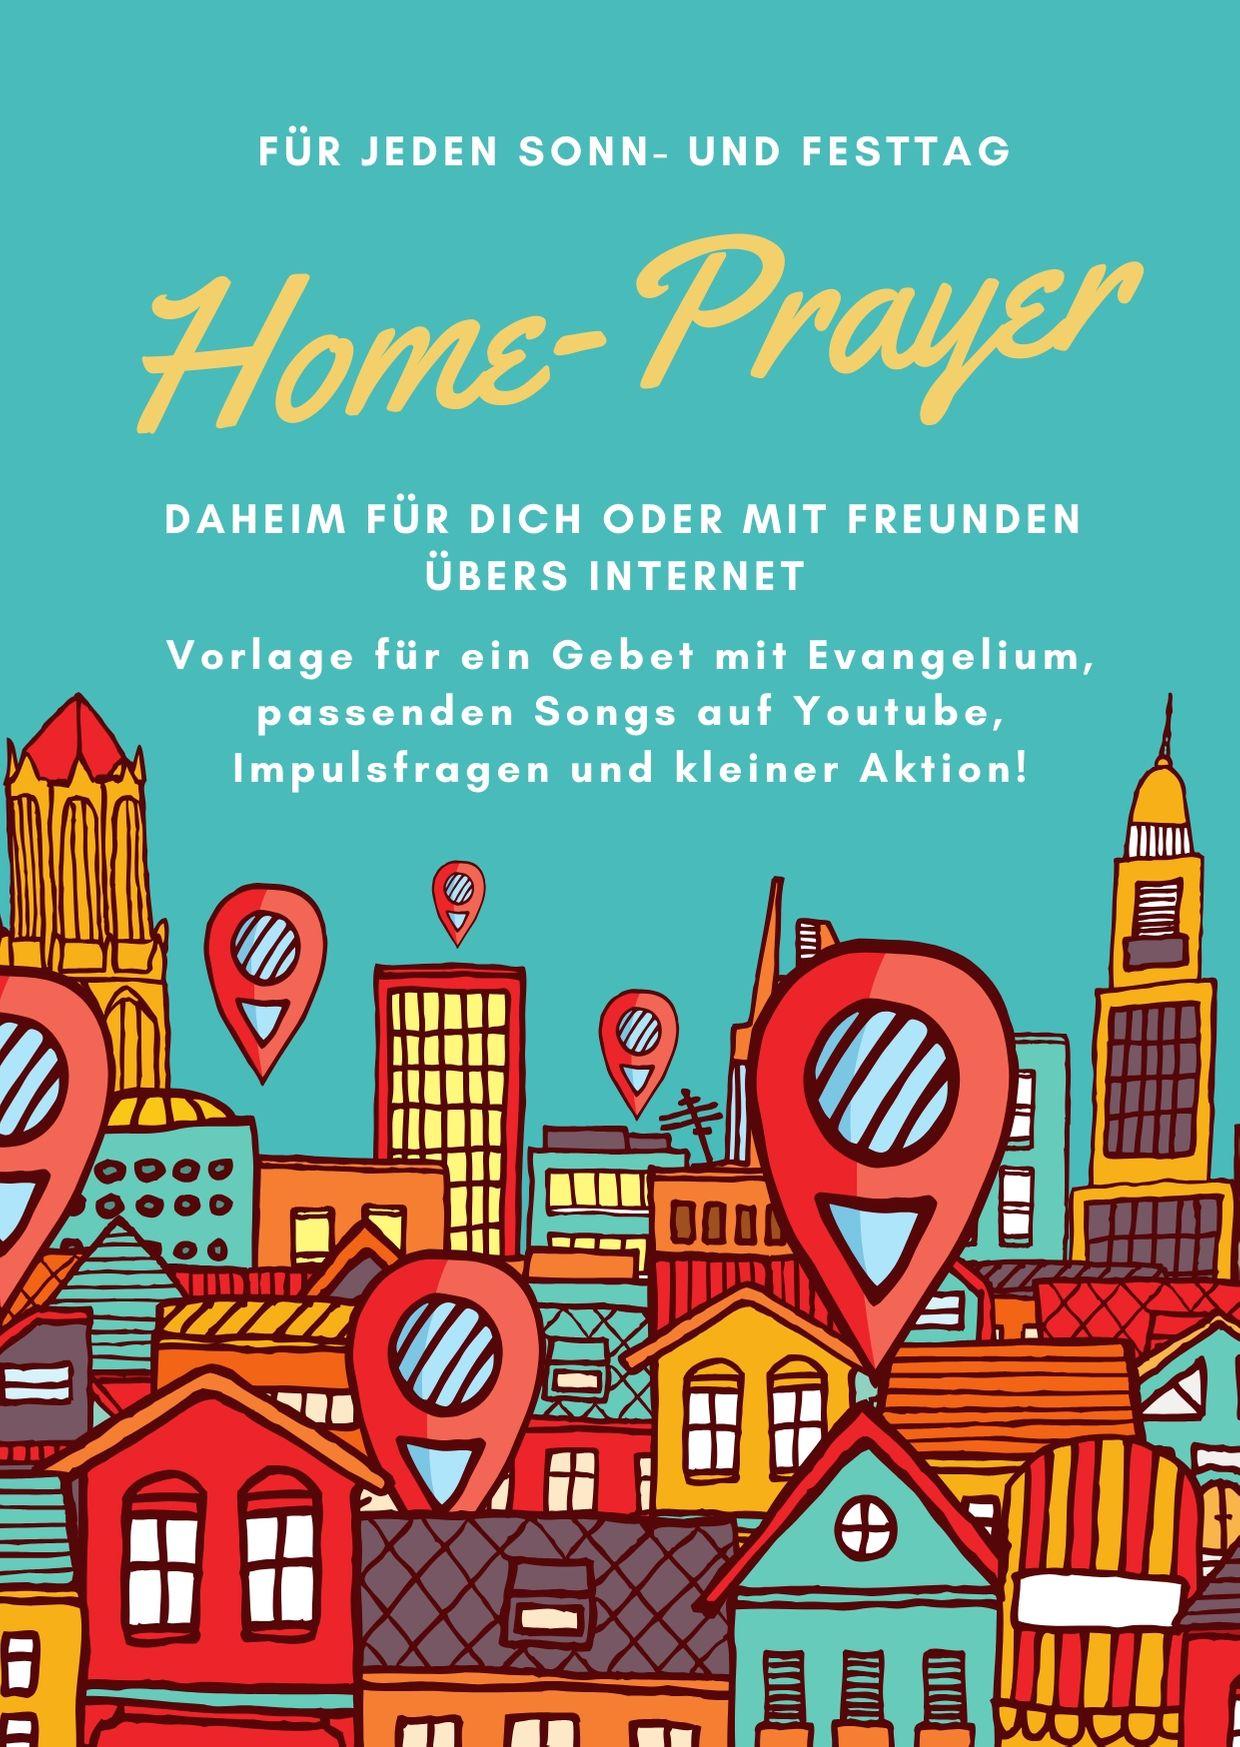 Home-Prayer